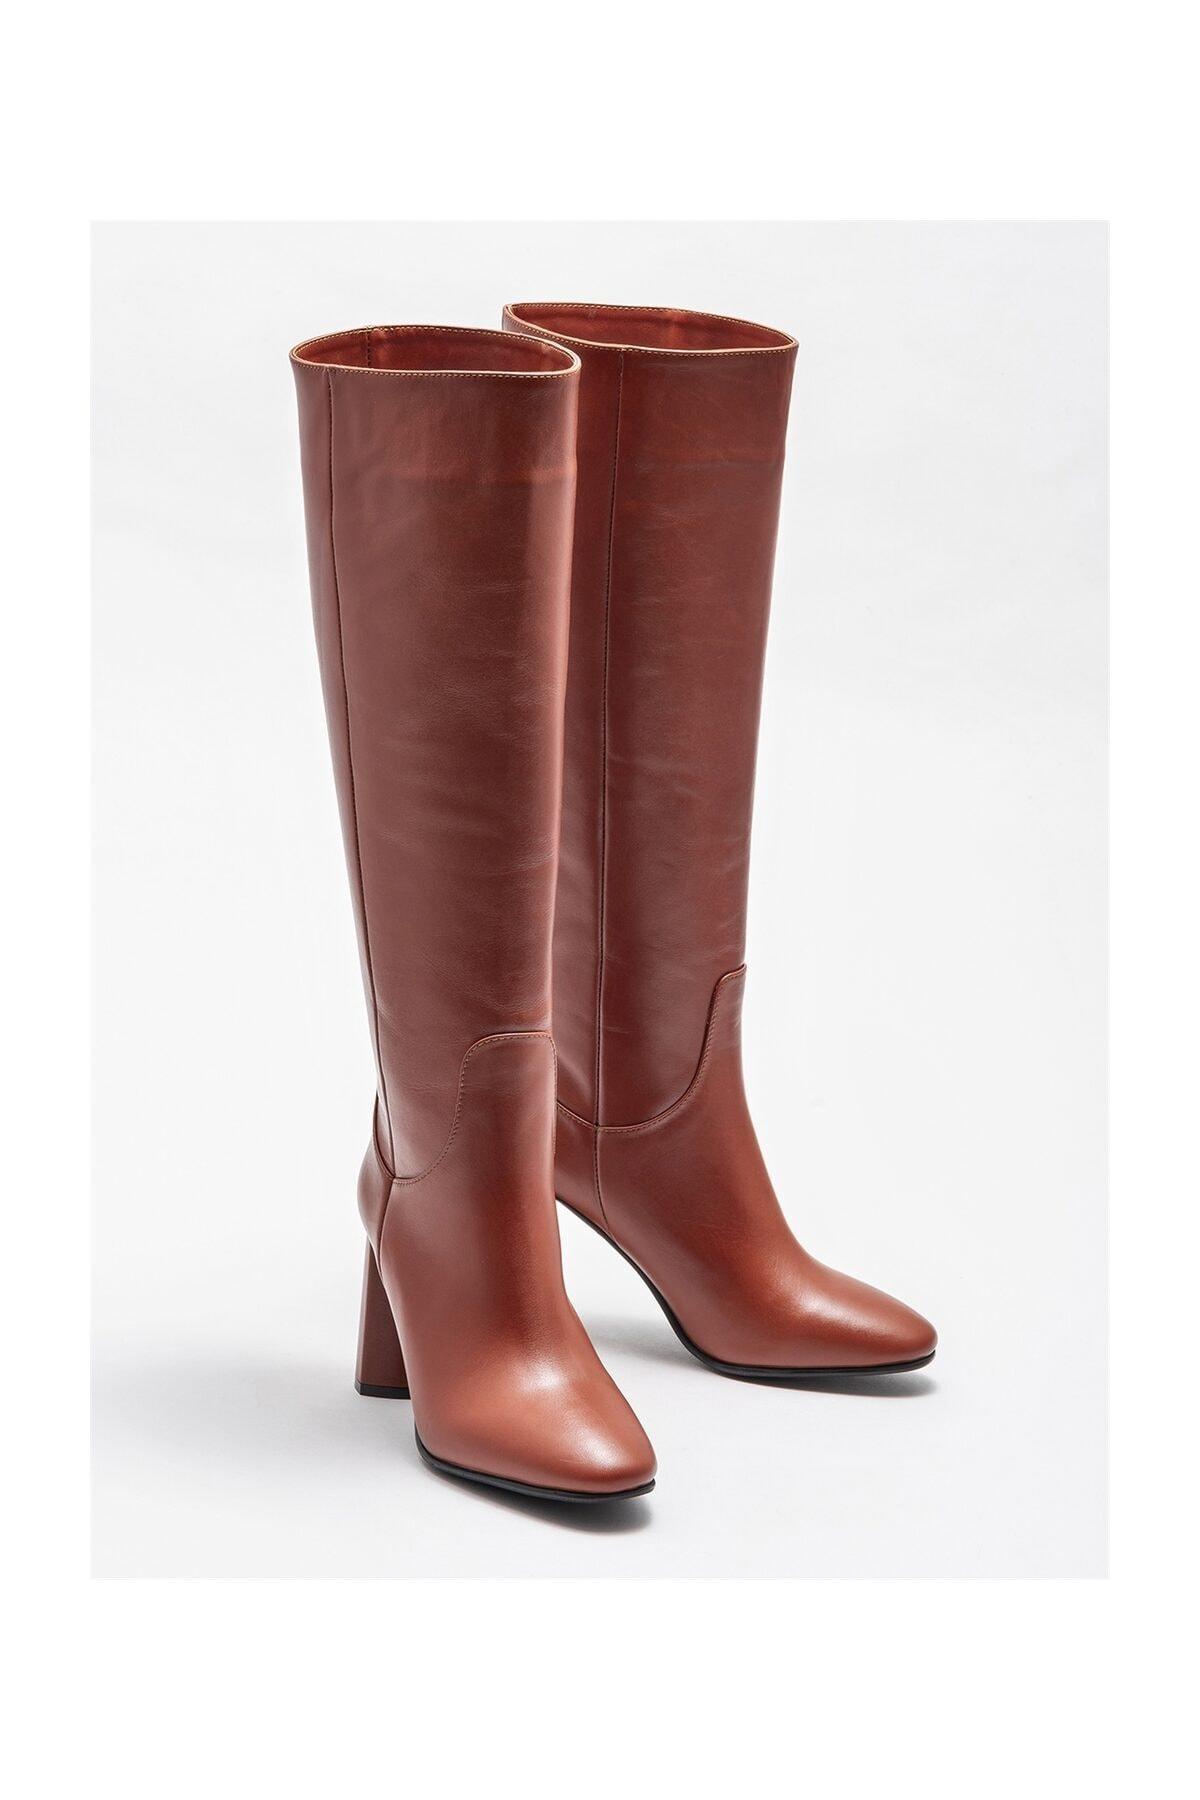 Elle Shoes Shoes Adrano-1 Kadın Çizme 20K052 2